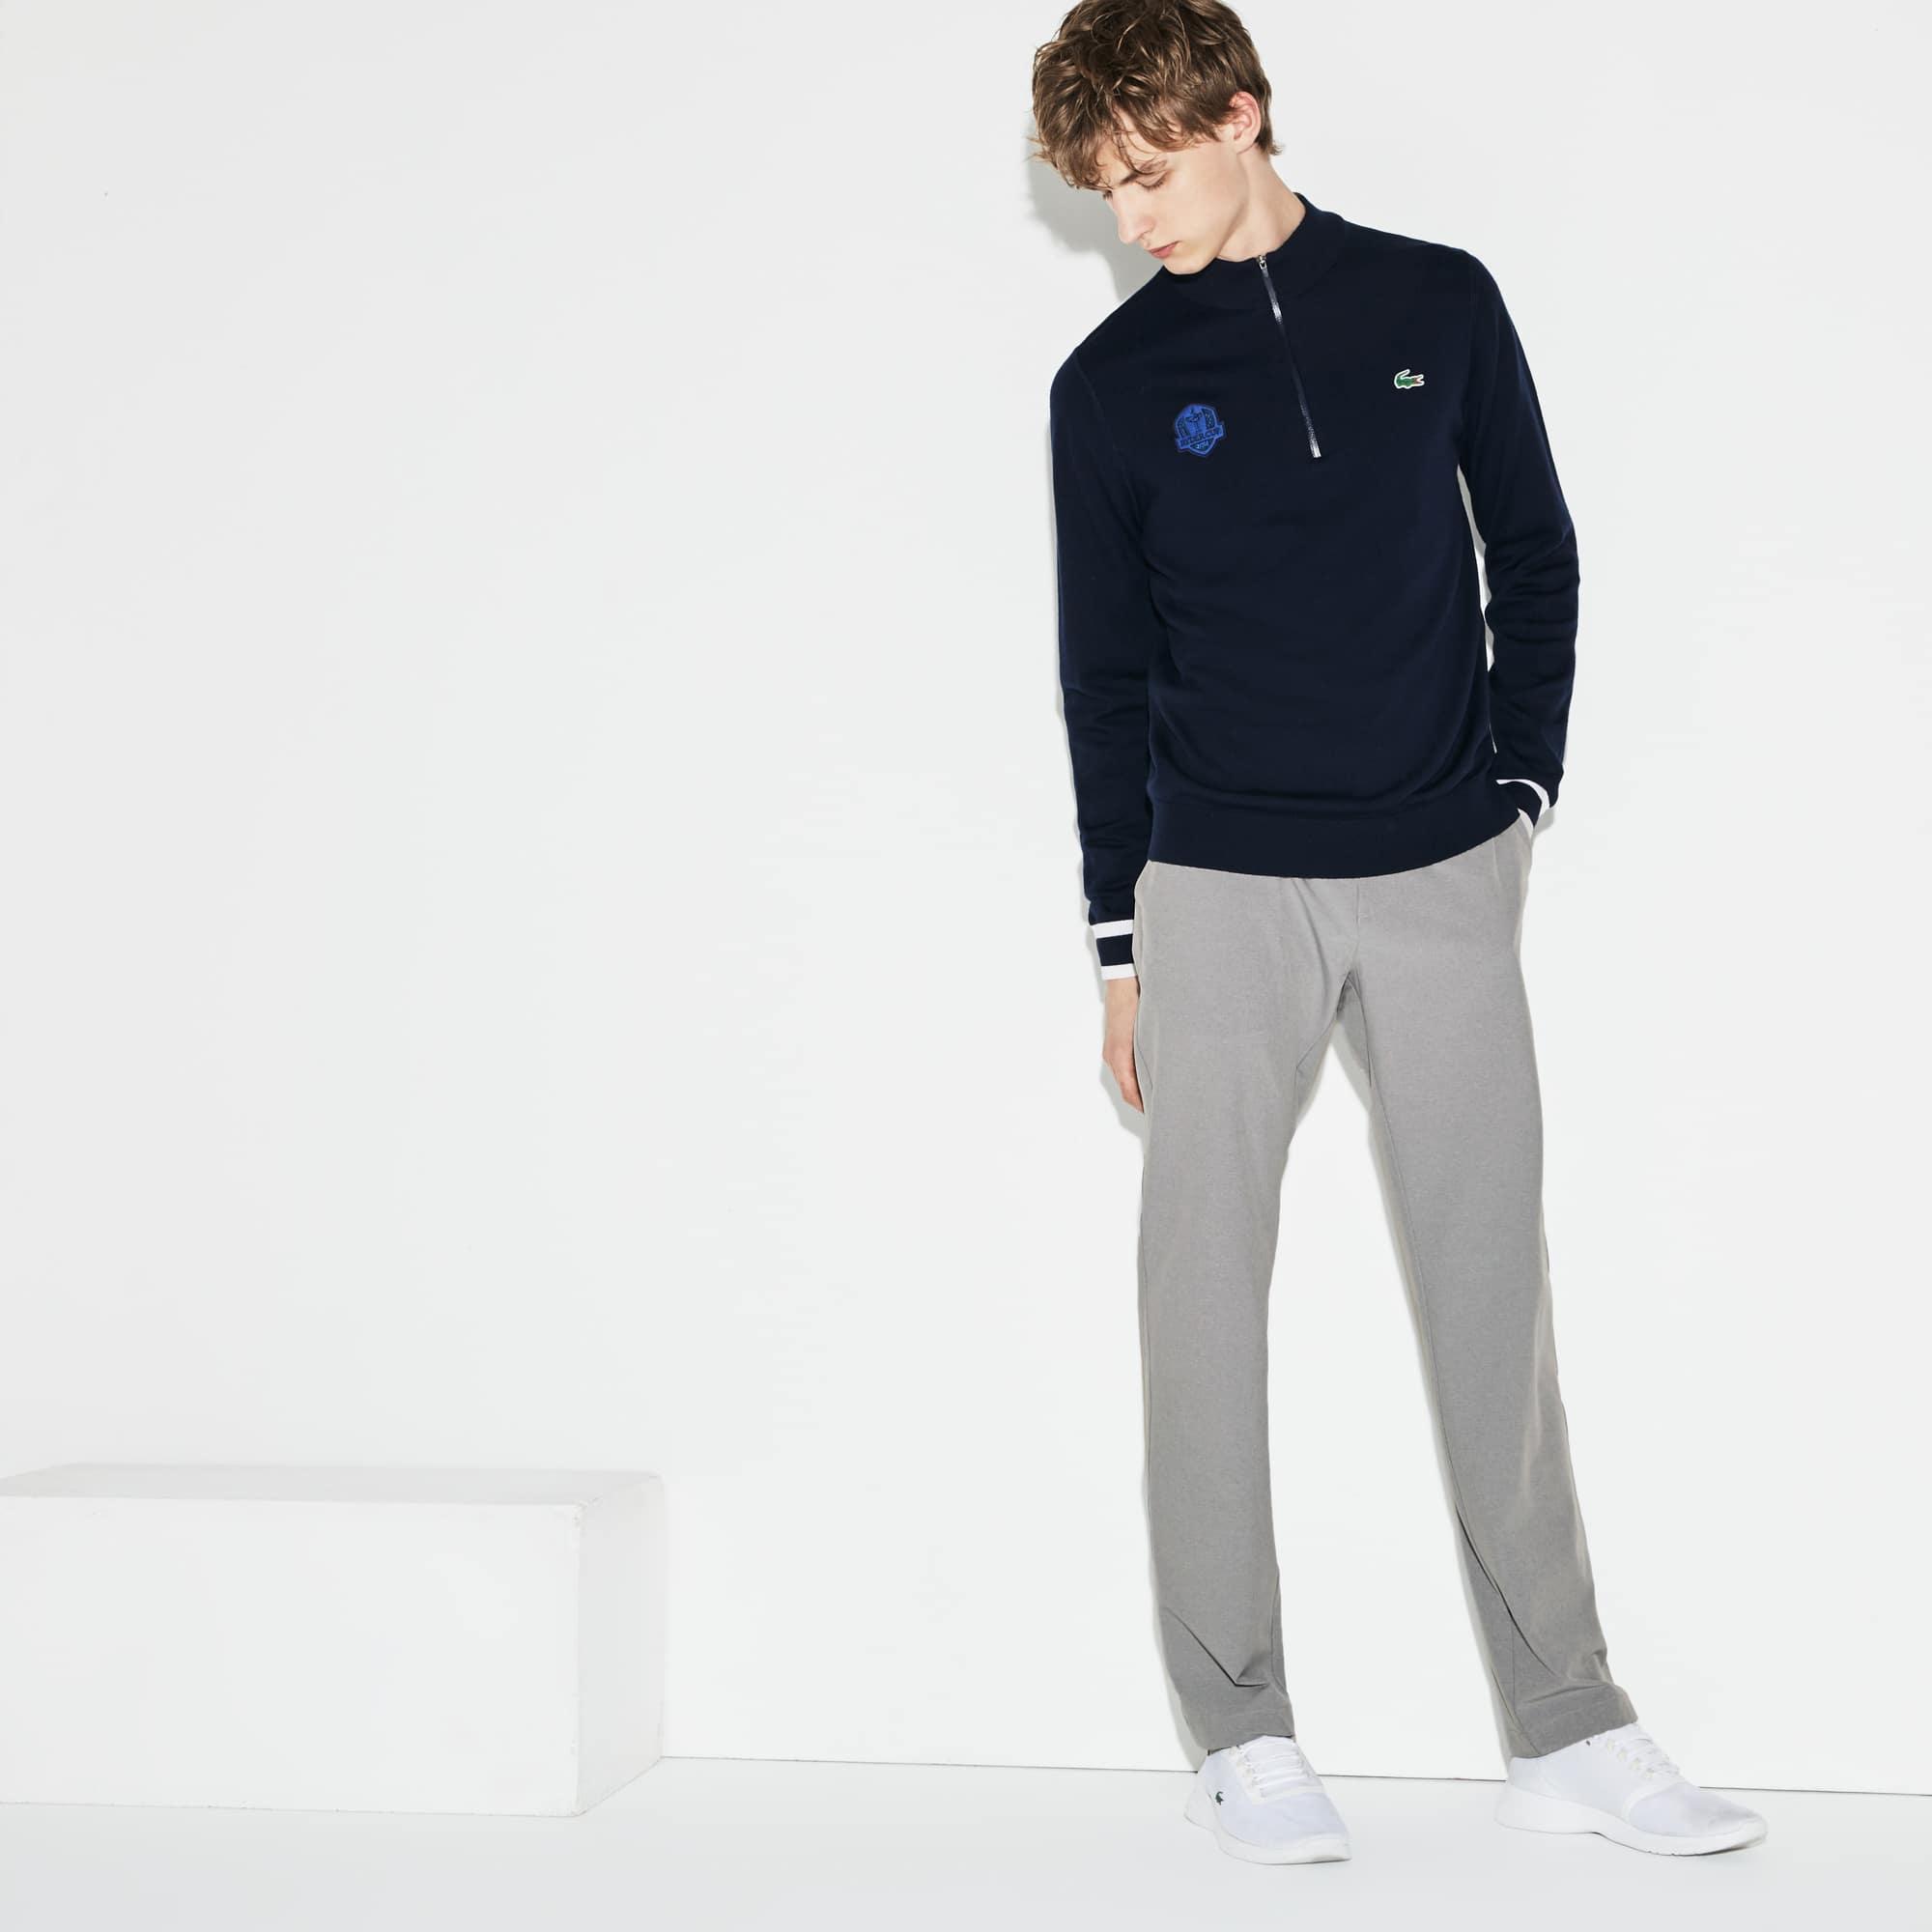 Pantalon chino Golf Lacoste SPORT en taffetas Édition Ryder Cup